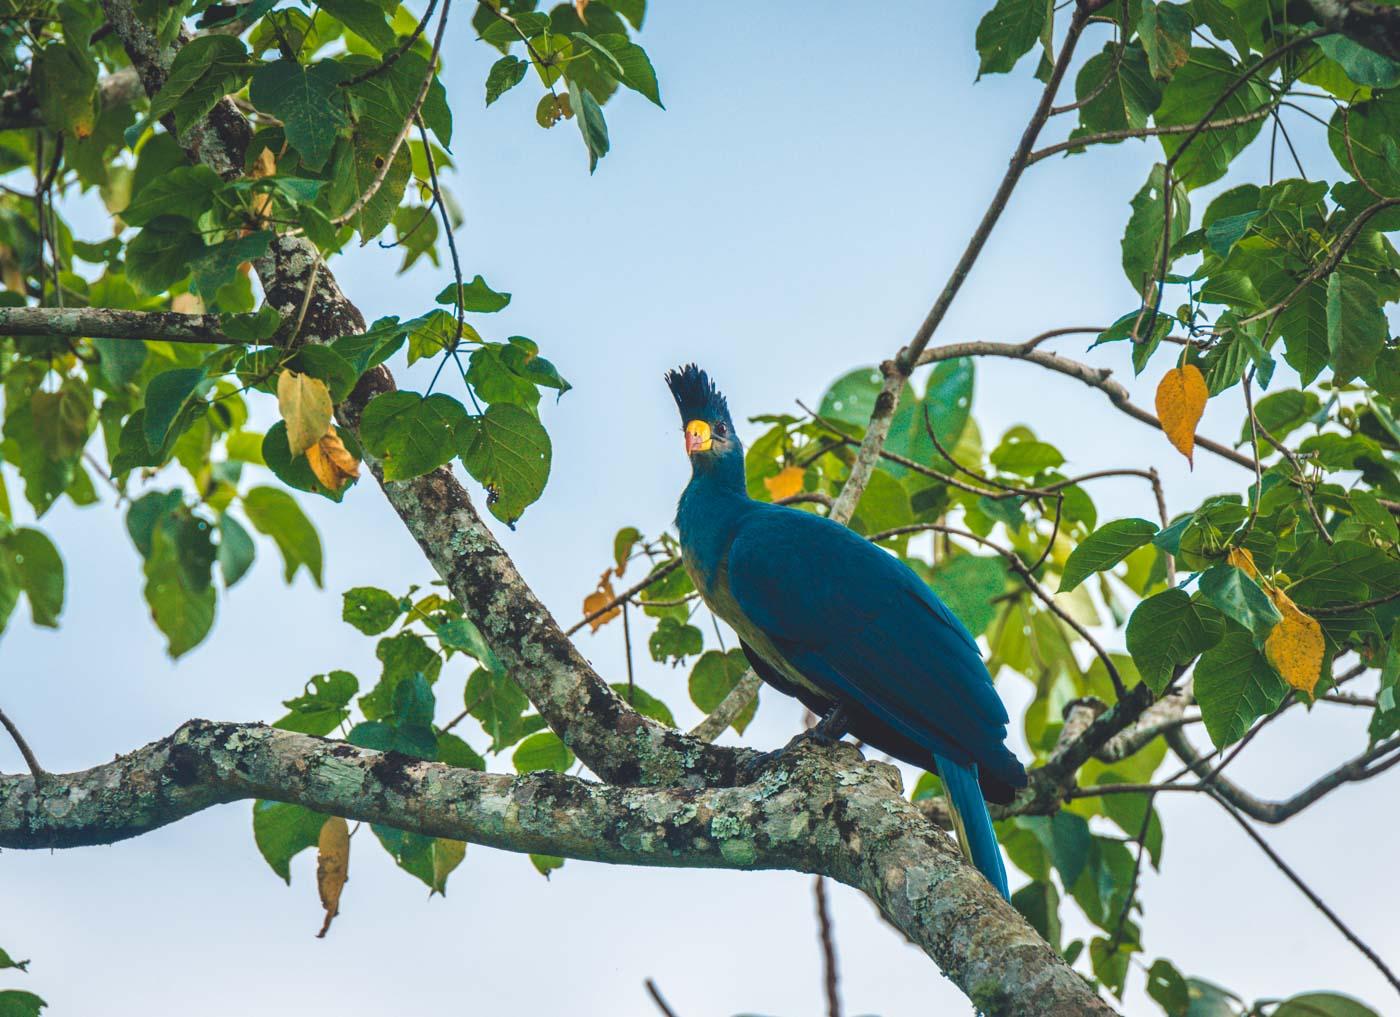 Blue Turaco at the Bigoti Wetland outside of Kibale National Park